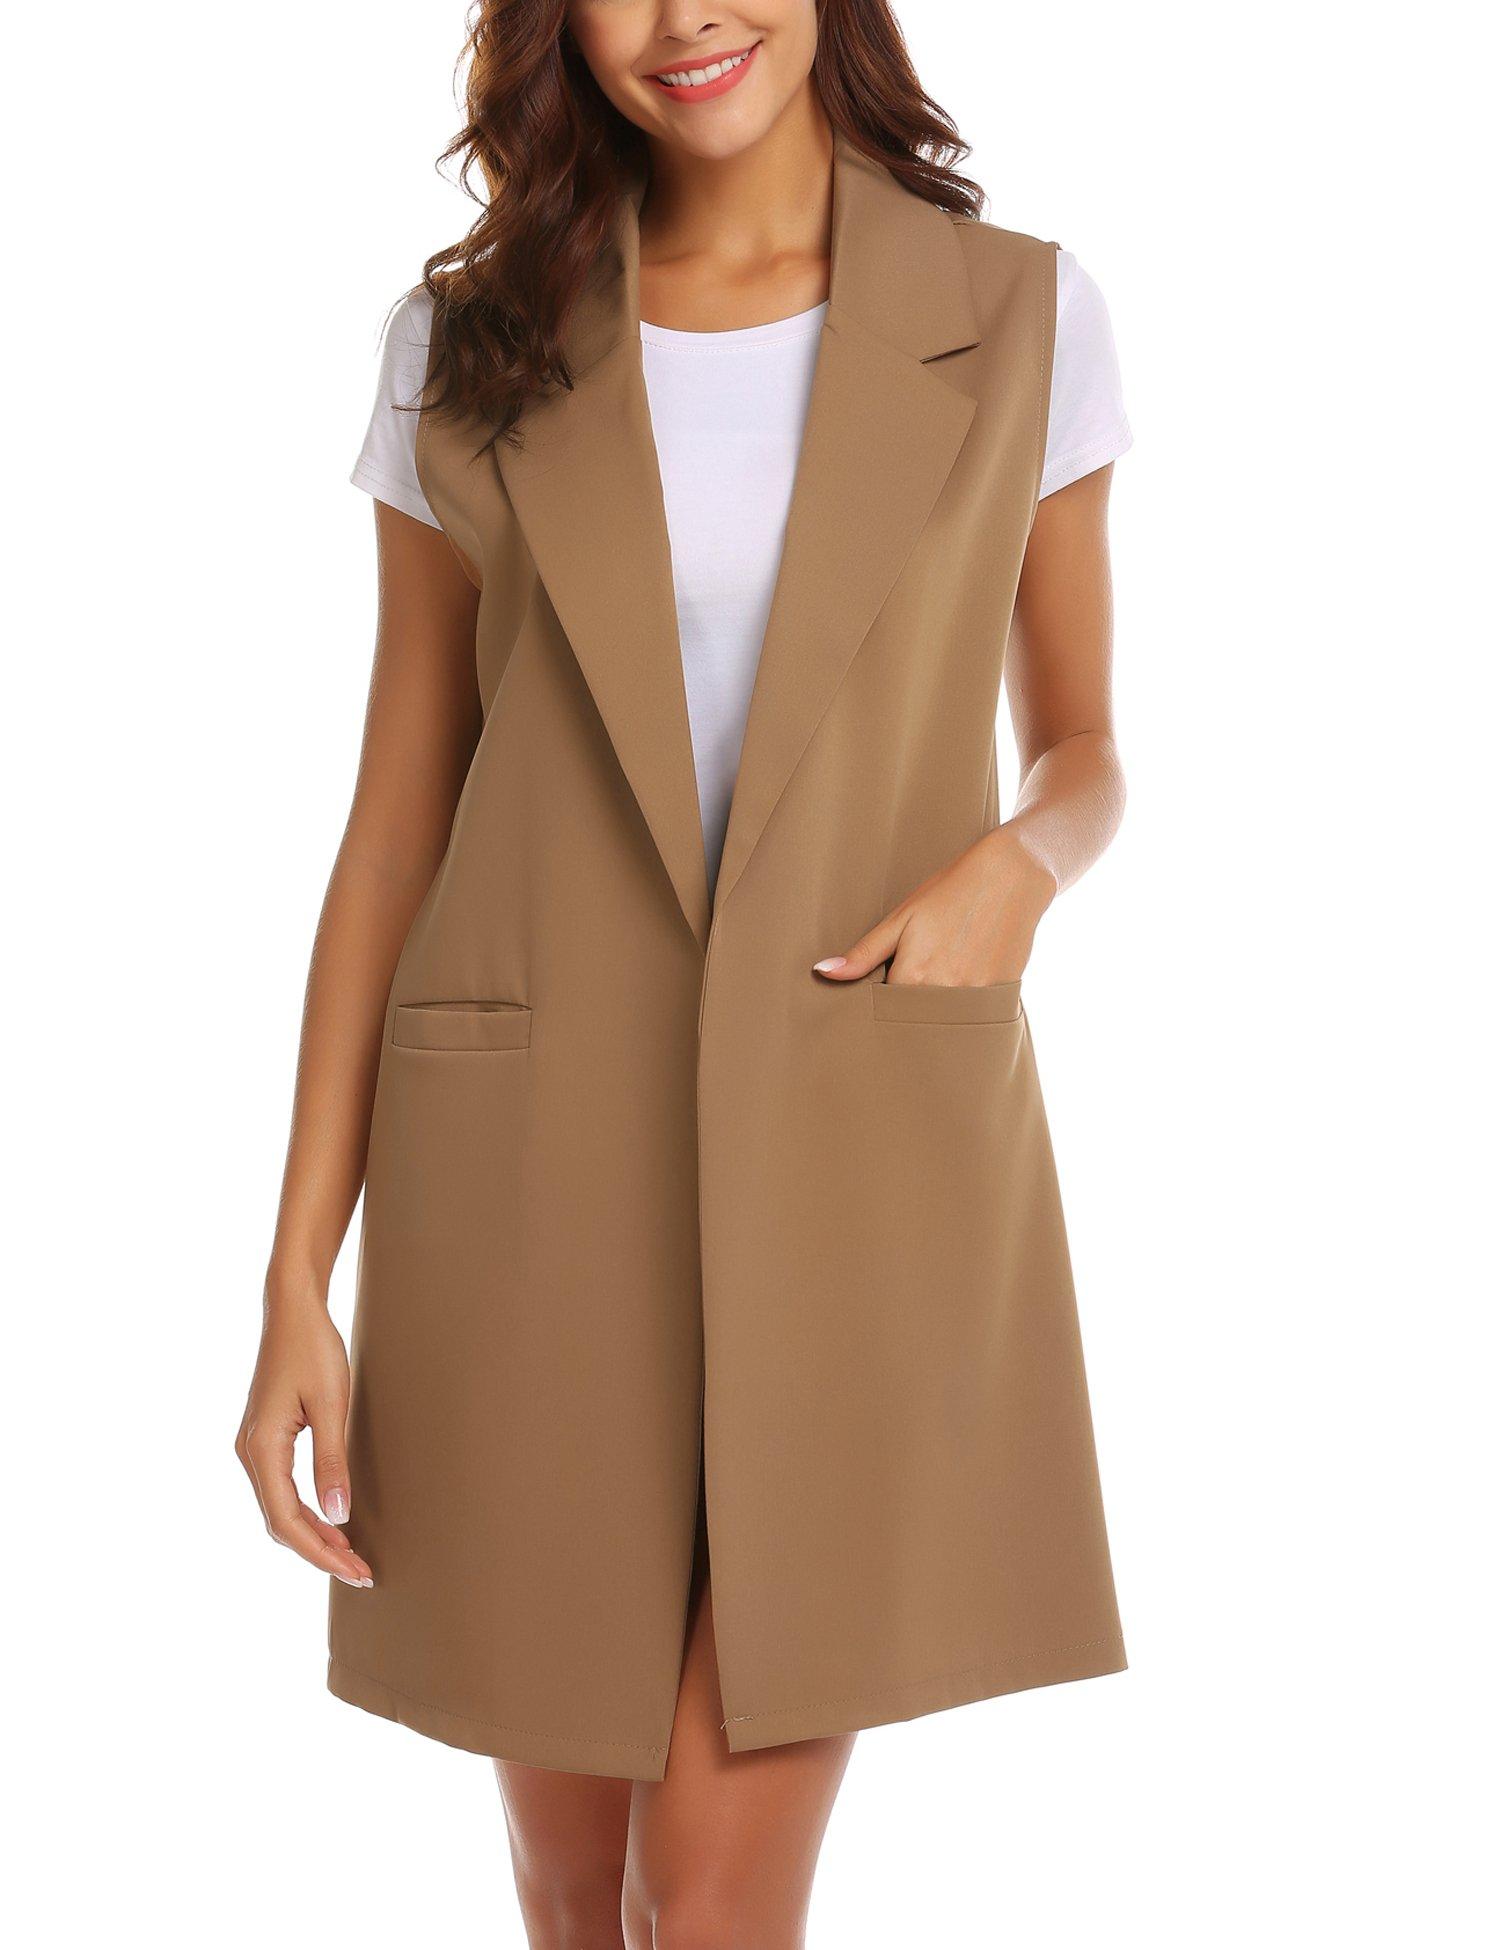 Showyoo Women's Long Sleeveless Duster Trench Vest Casual Lapel Blazer Jacket Khaki M